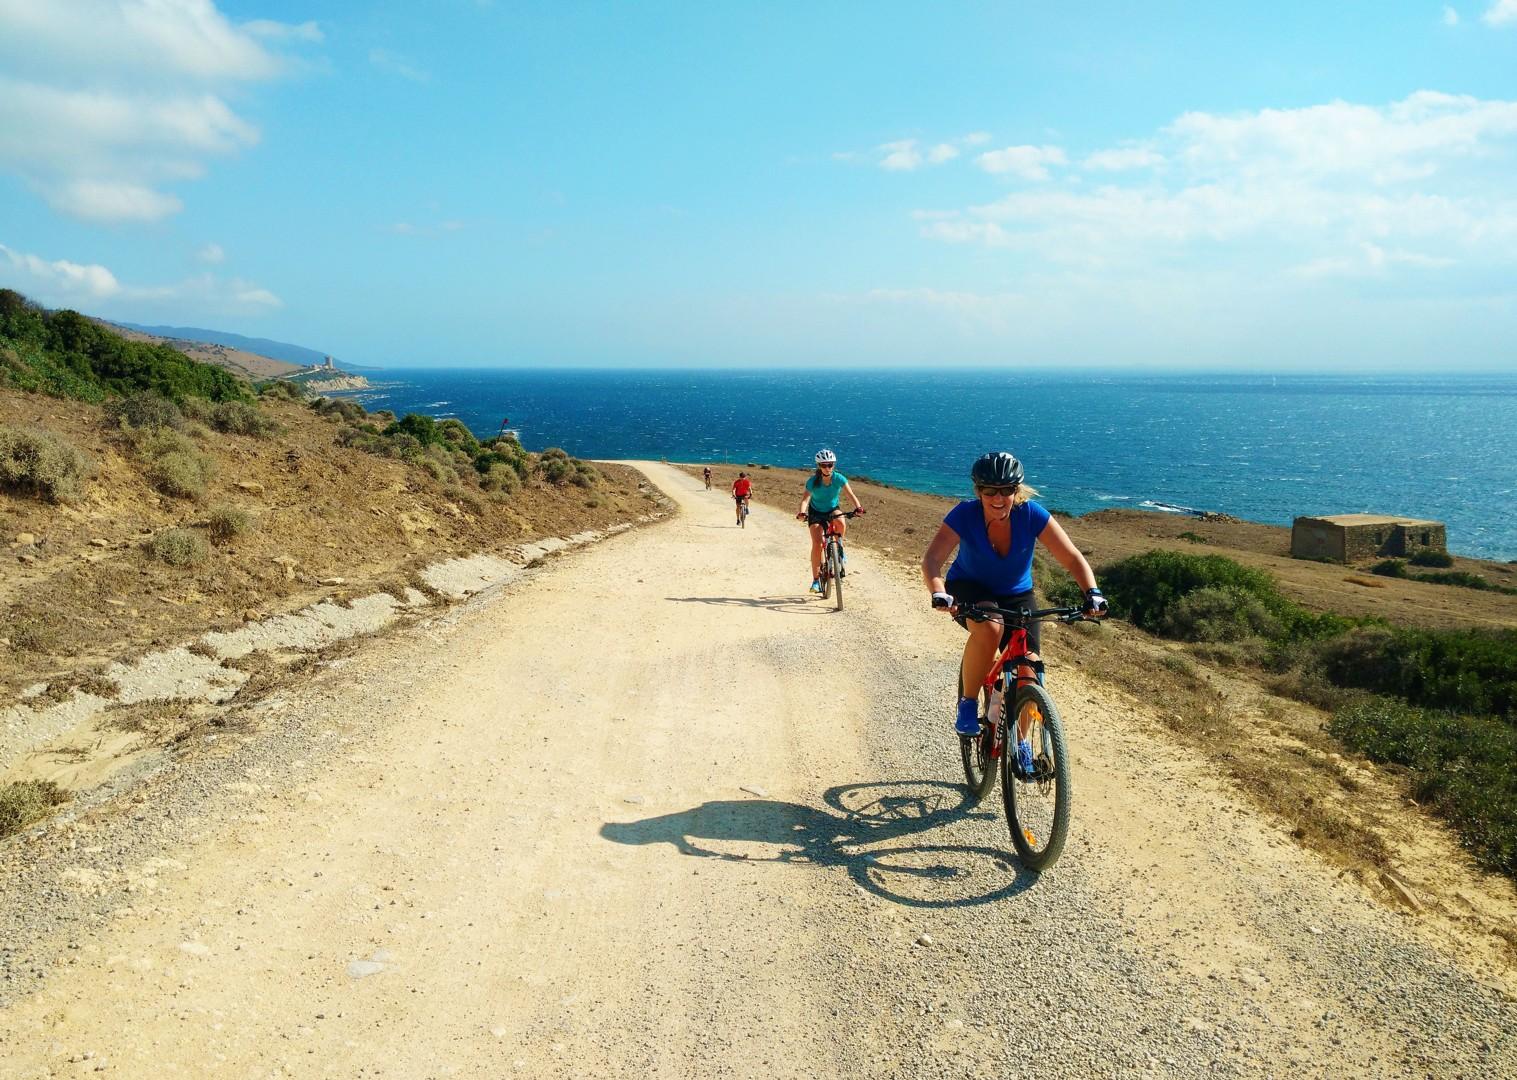 IMG_20171023_131421563.jpg - Southern Spain - Coastal Adventurer - Family Cycling